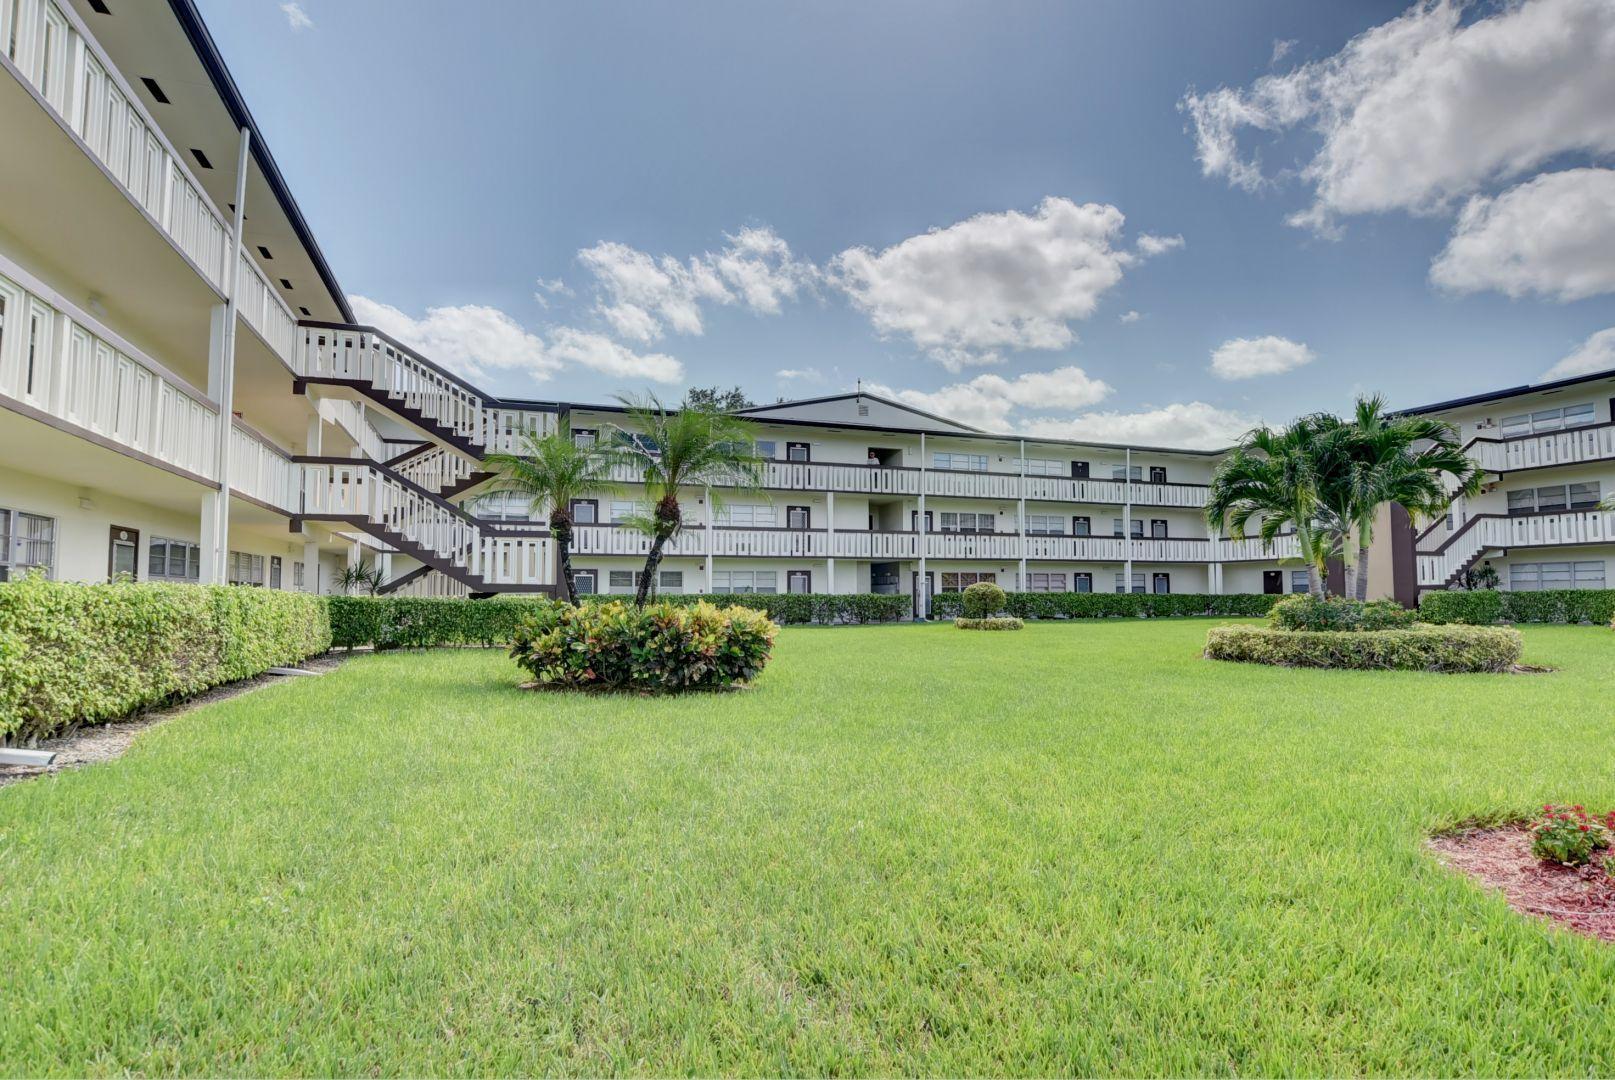 141 Suffolk D #141, Boca Raton, FL, 33434